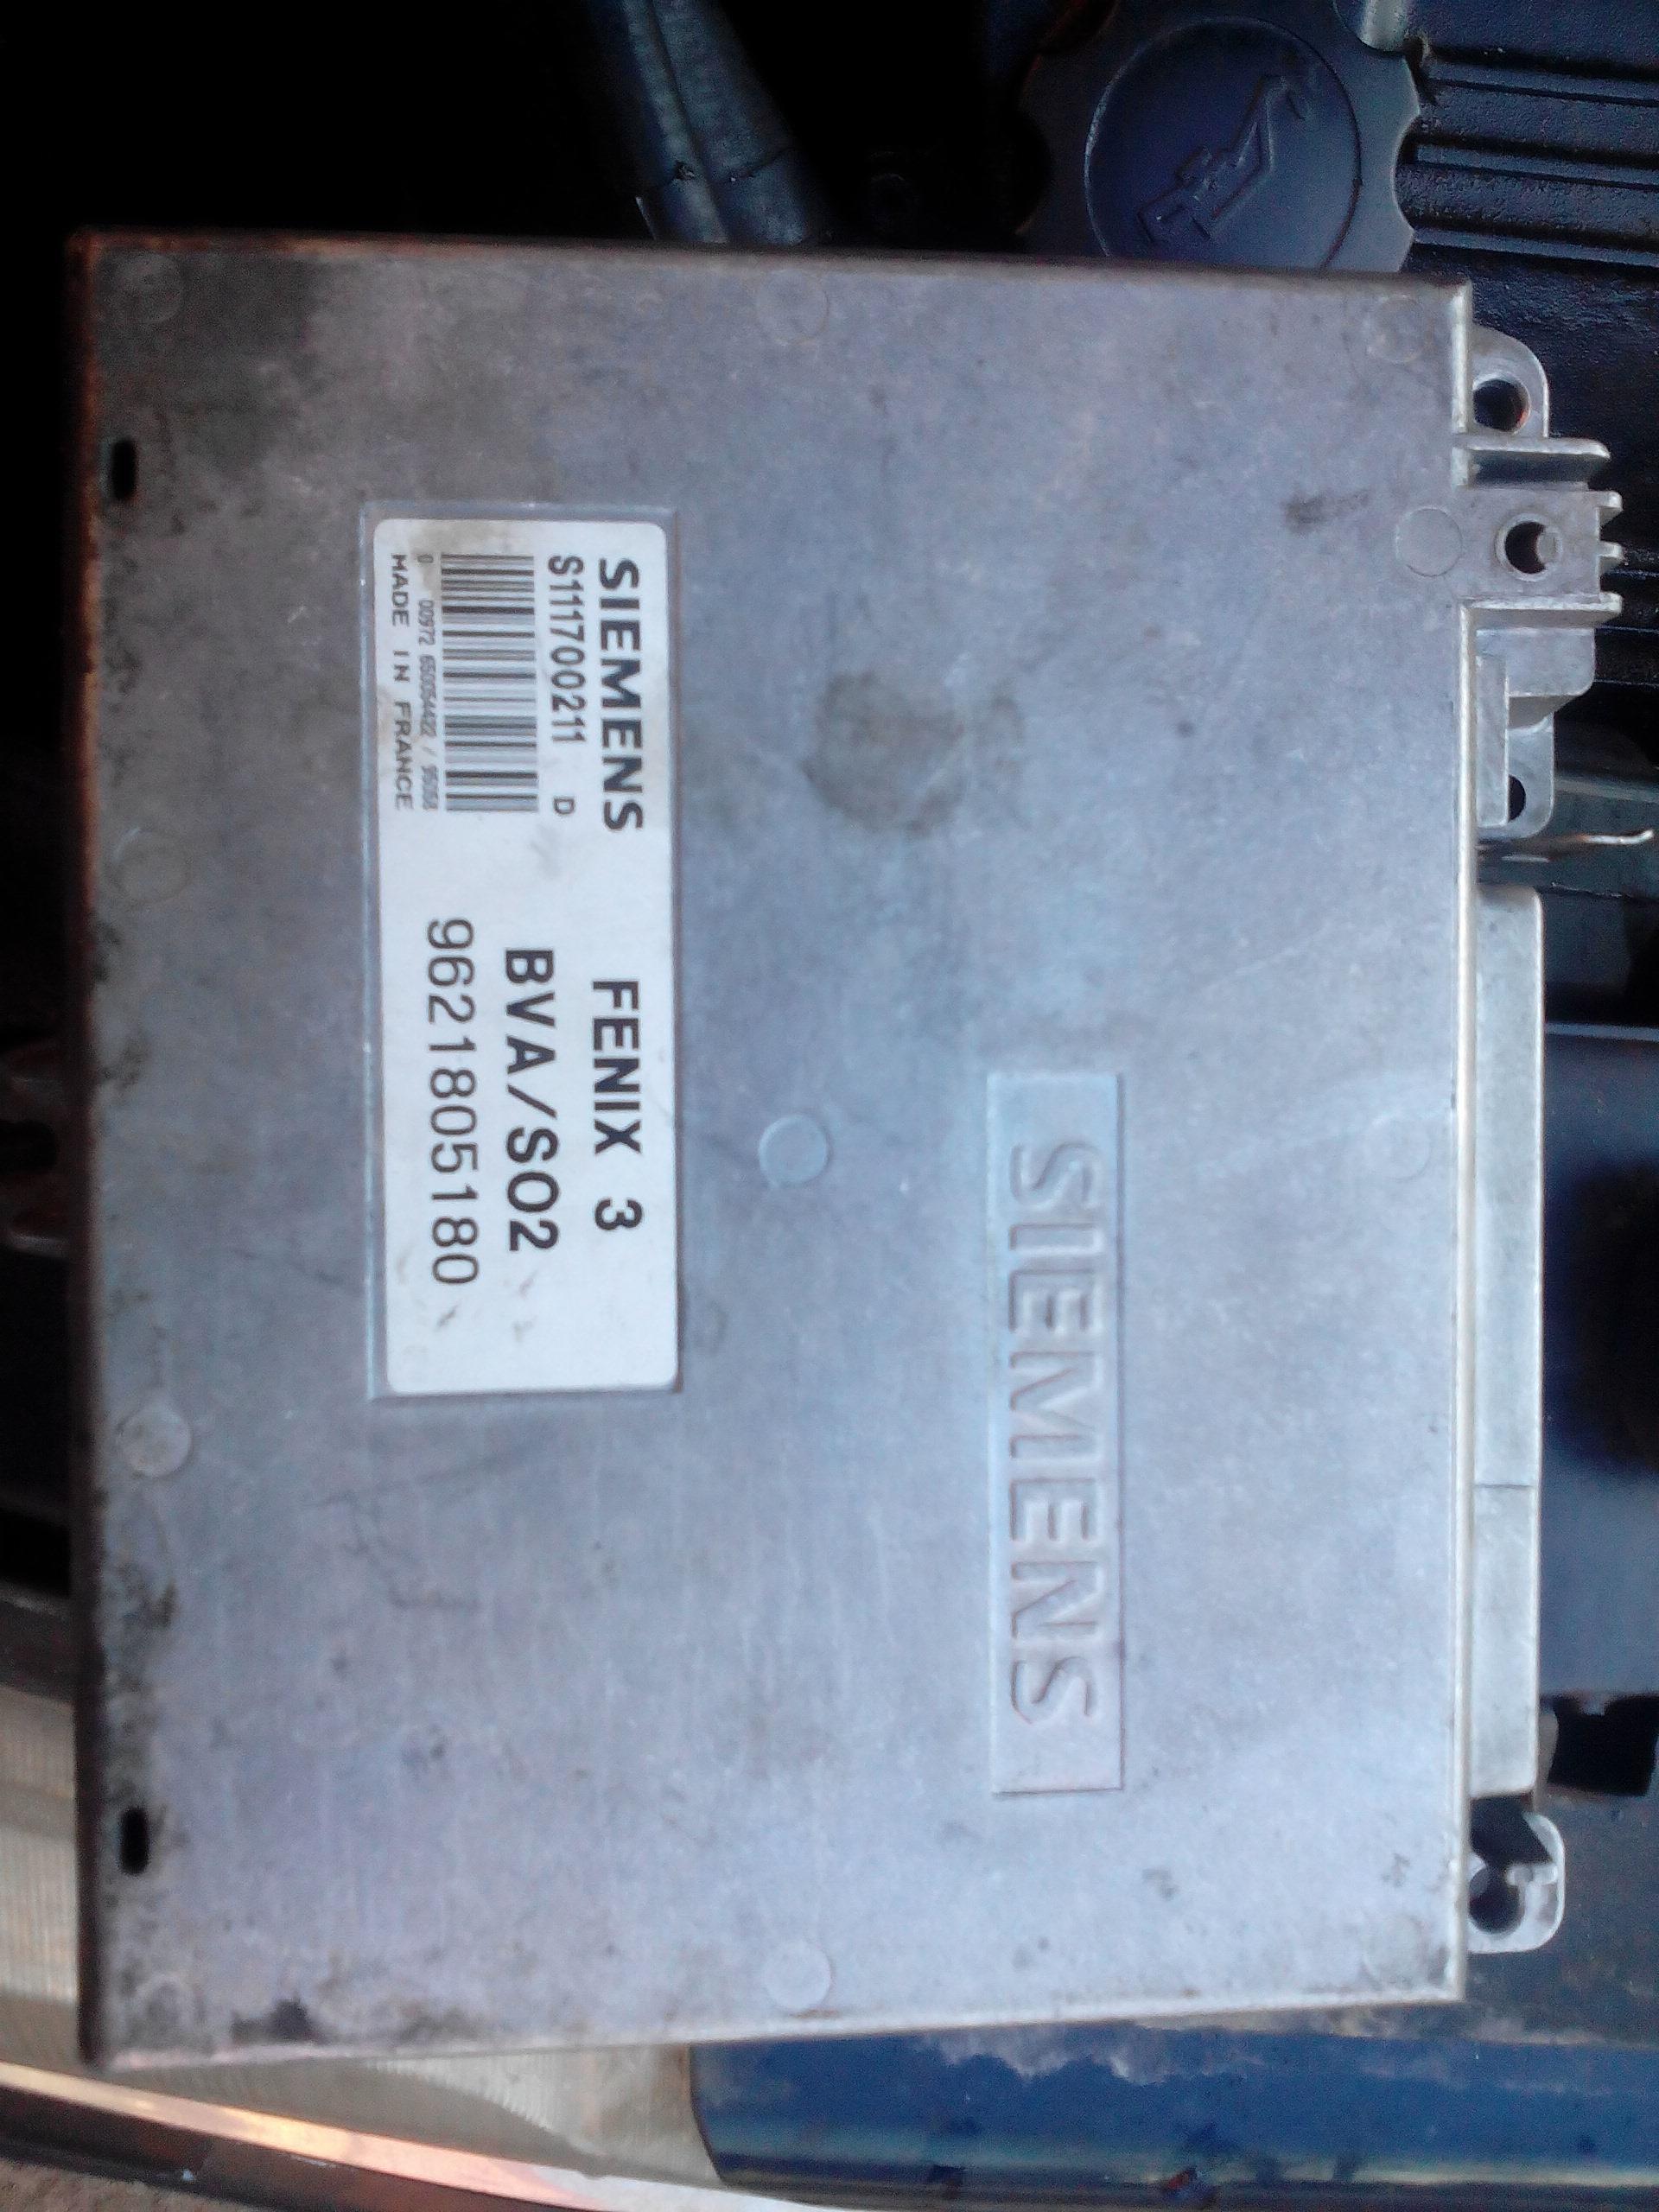 VCDS 12120 RU HEX  CAN  адаптер для диагностики